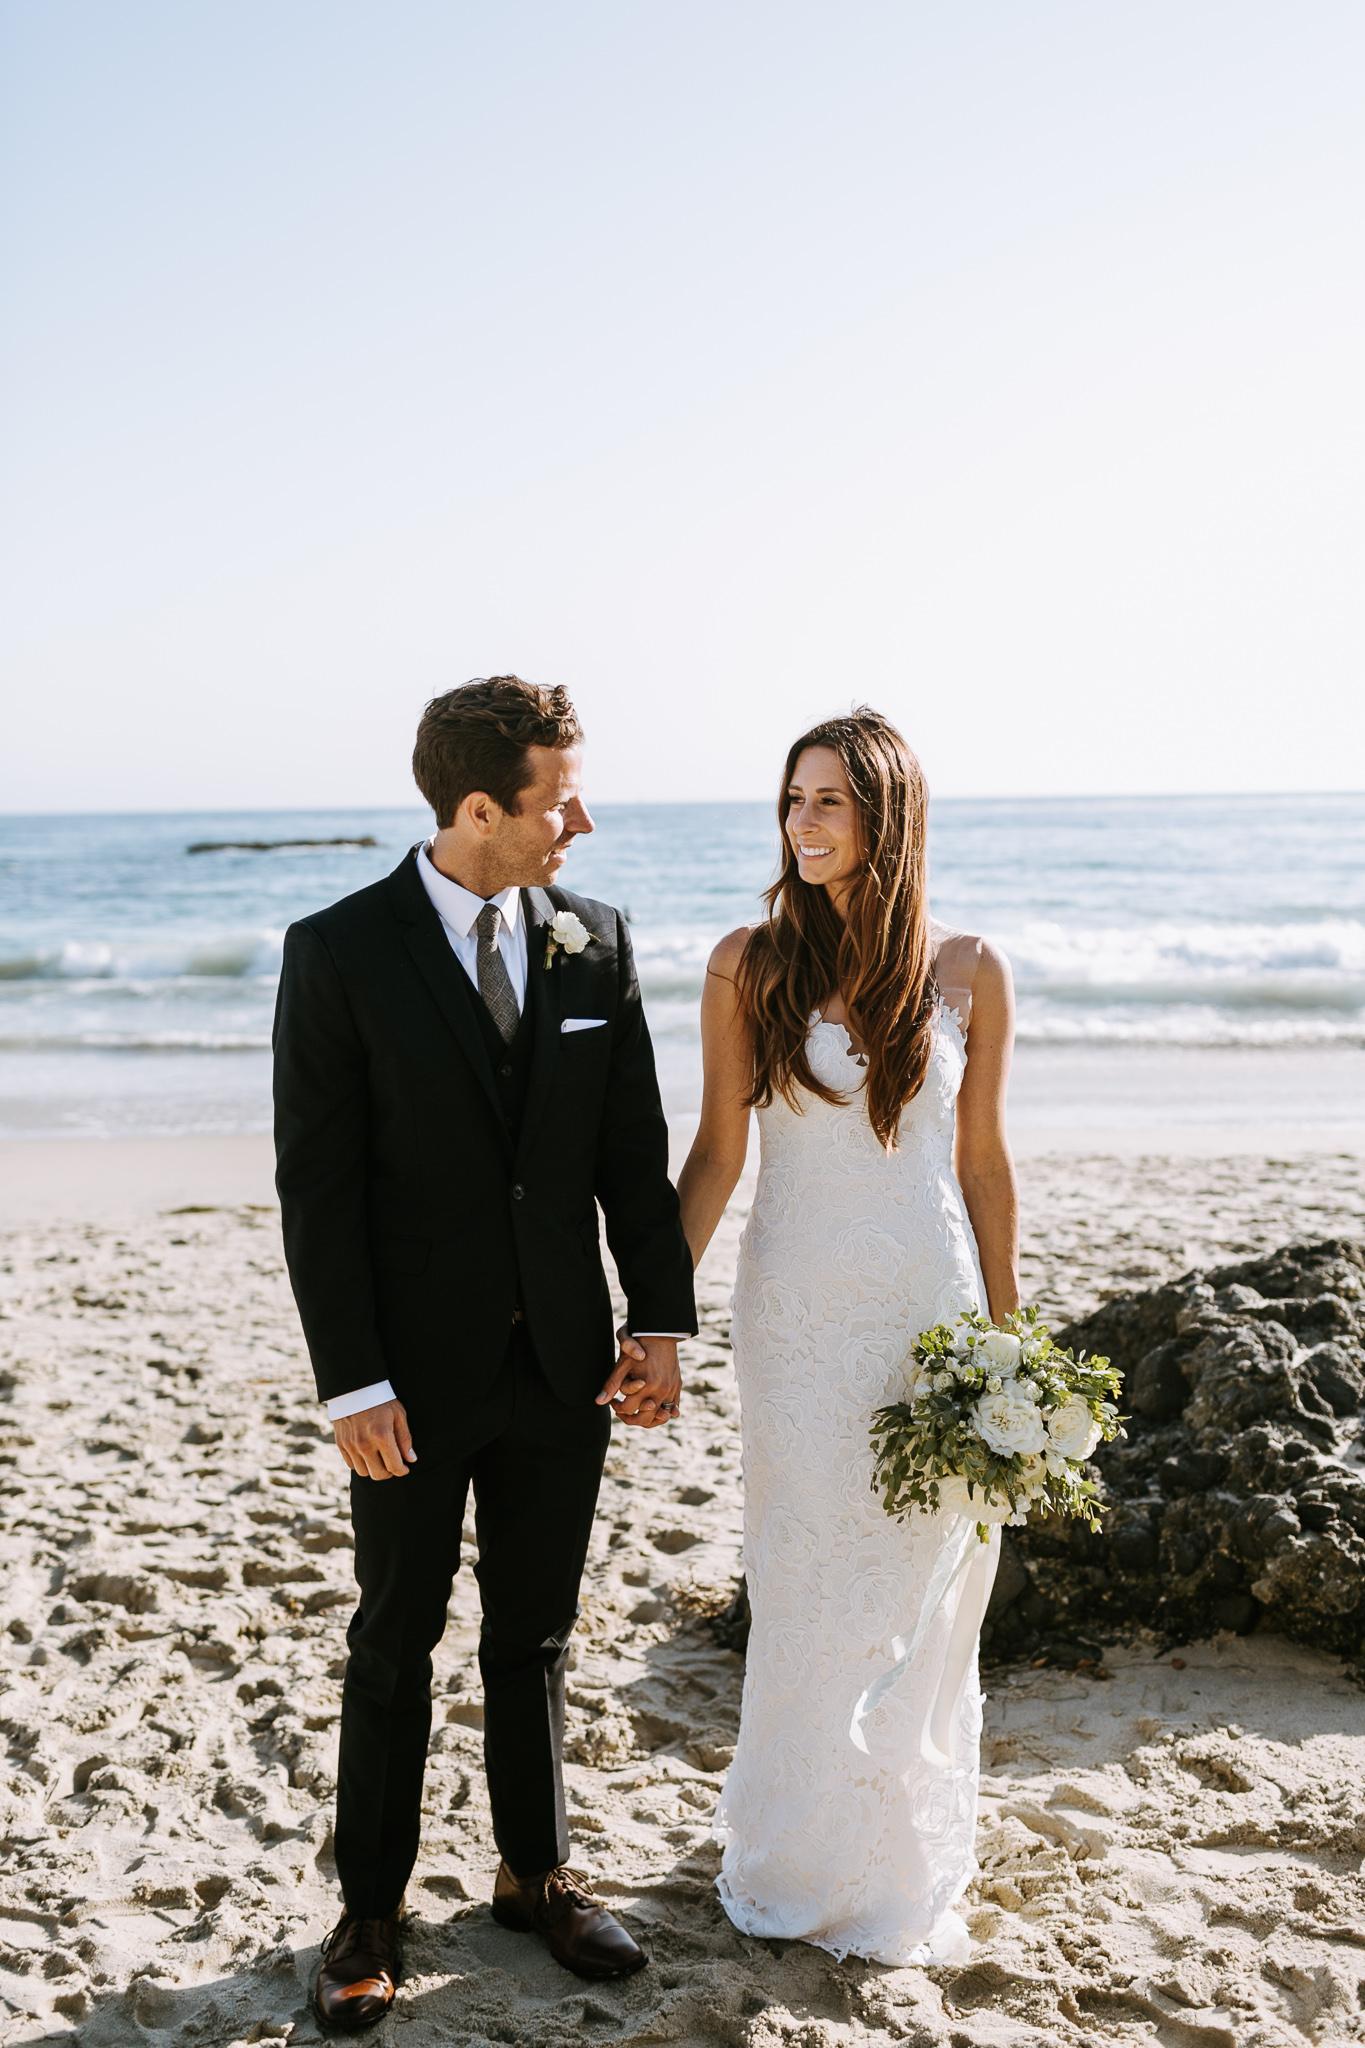 LagunaBeach-WeddingPhotographer-43.jpg